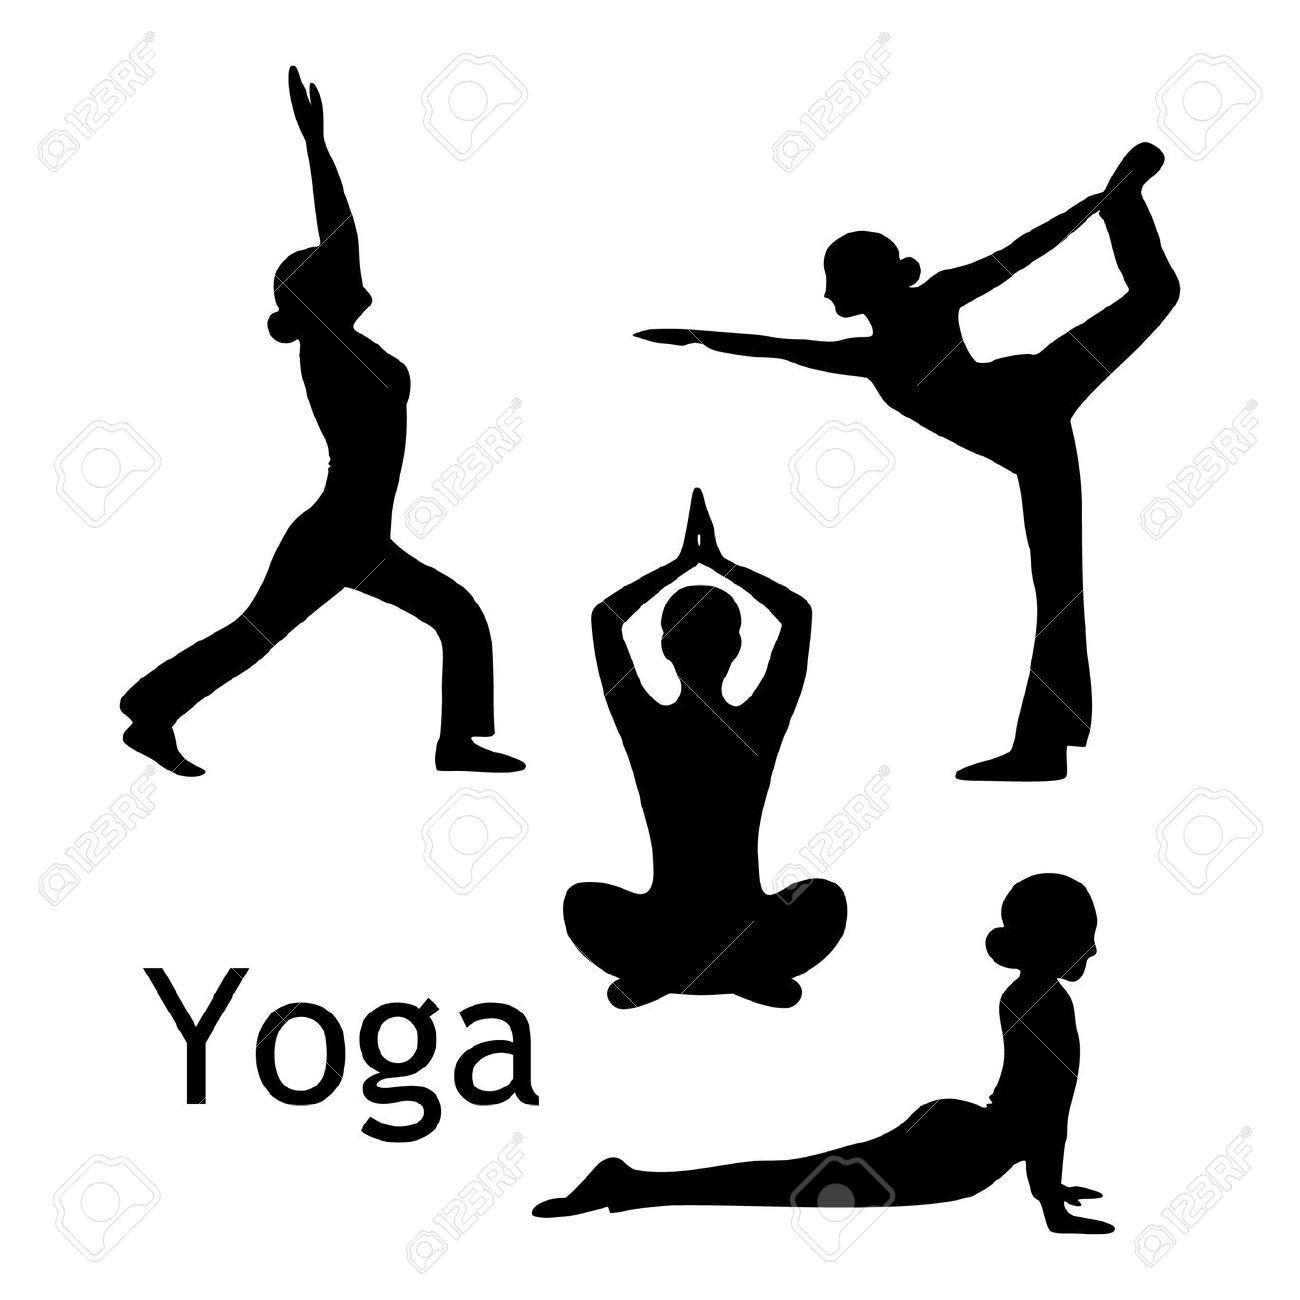 Yoga Pose Clipart #1.